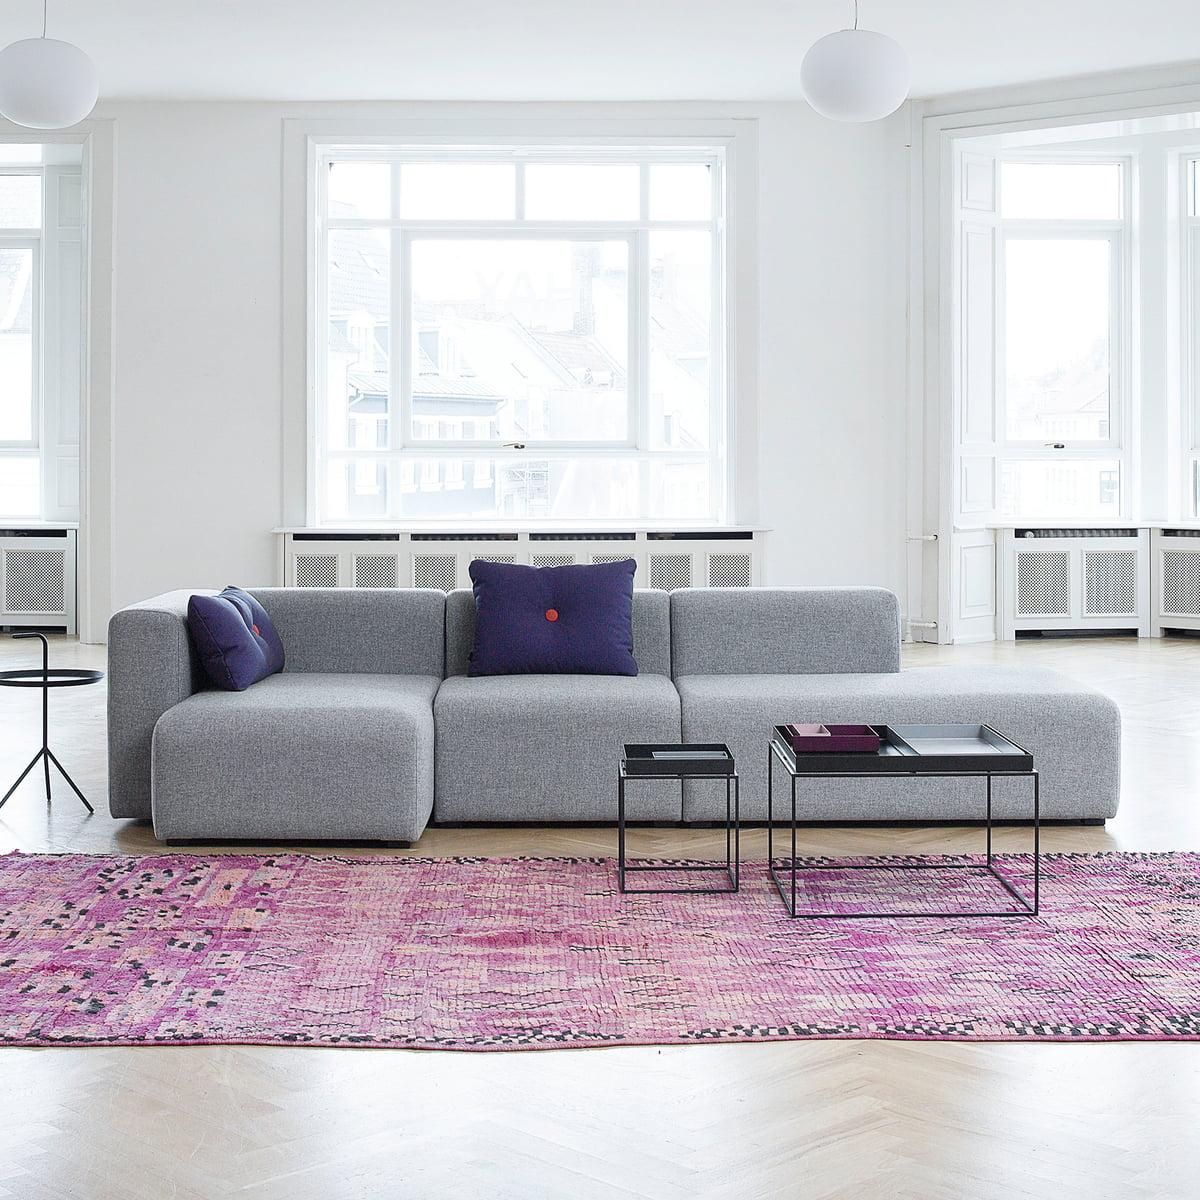 mags sofa module narrow von hay im shop. Black Bedroom Furniture Sets. Home Design Ideas